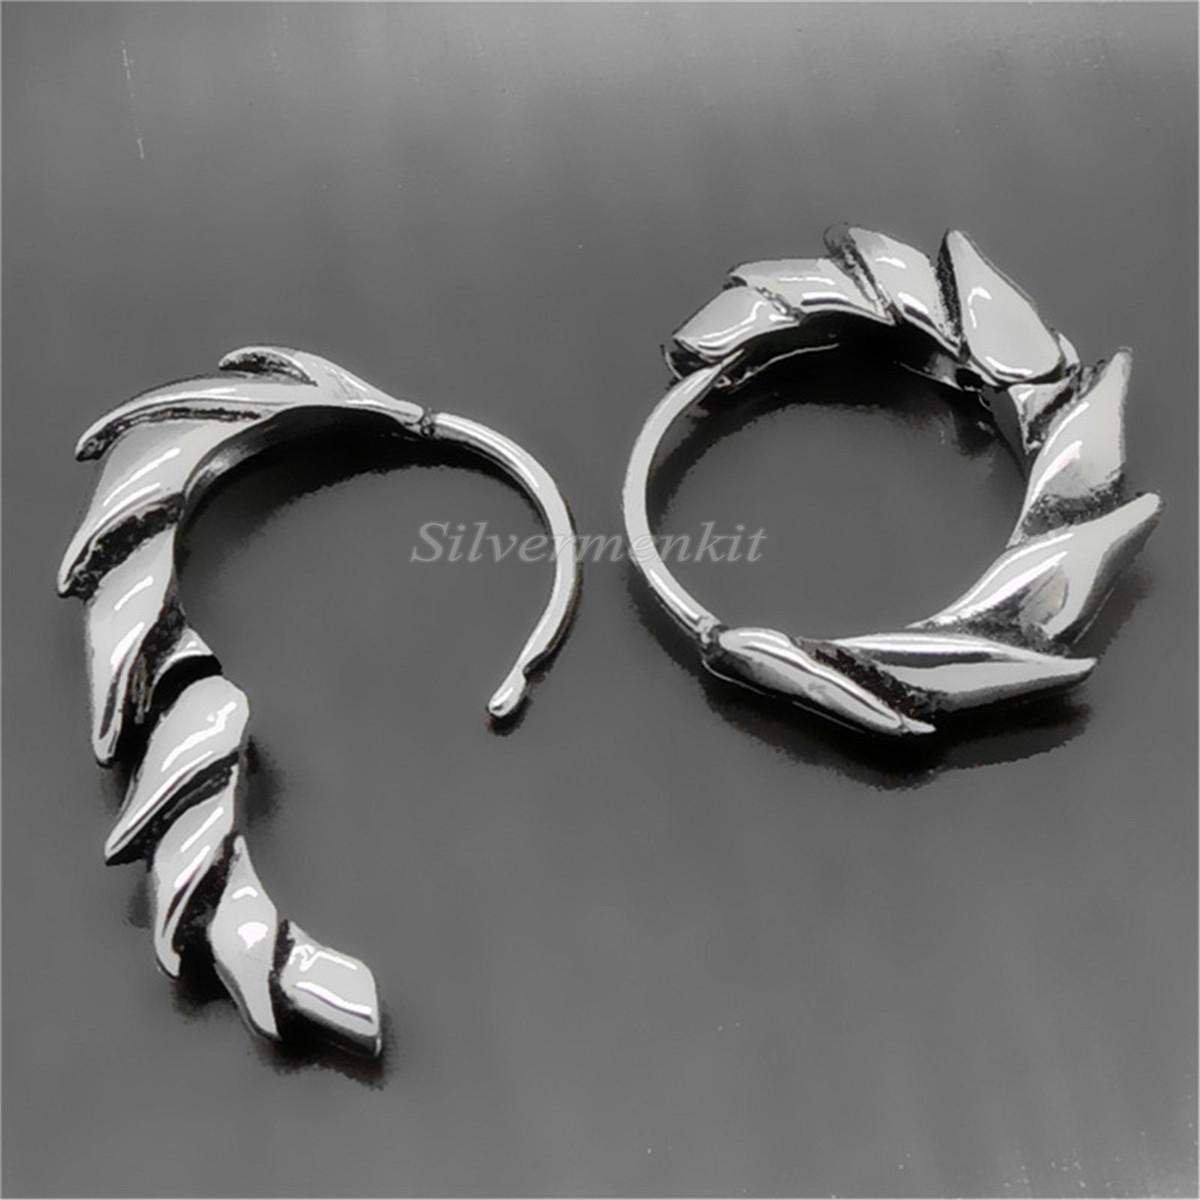 Silver Dragon Blade Stainless Steel Huggie Men Individuality Earrings Allergy